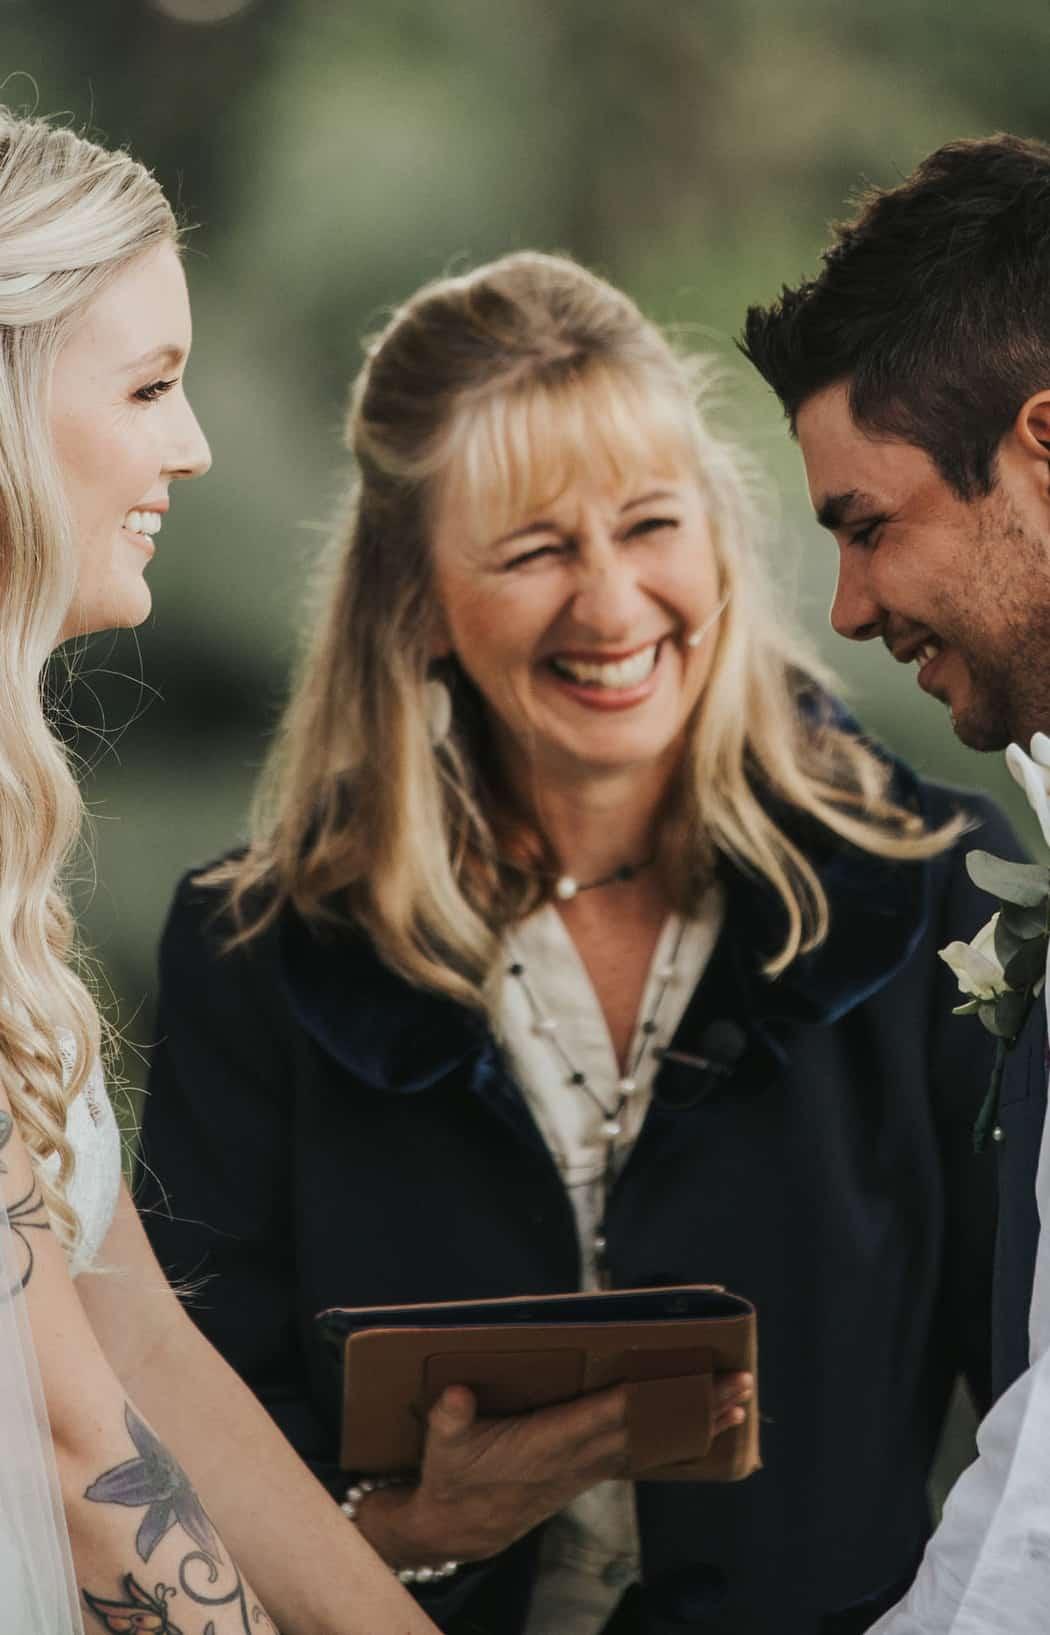 Sunshine Coast wedding and funeral celebrant for weddings and events on the Sunshine Coast and hinterland